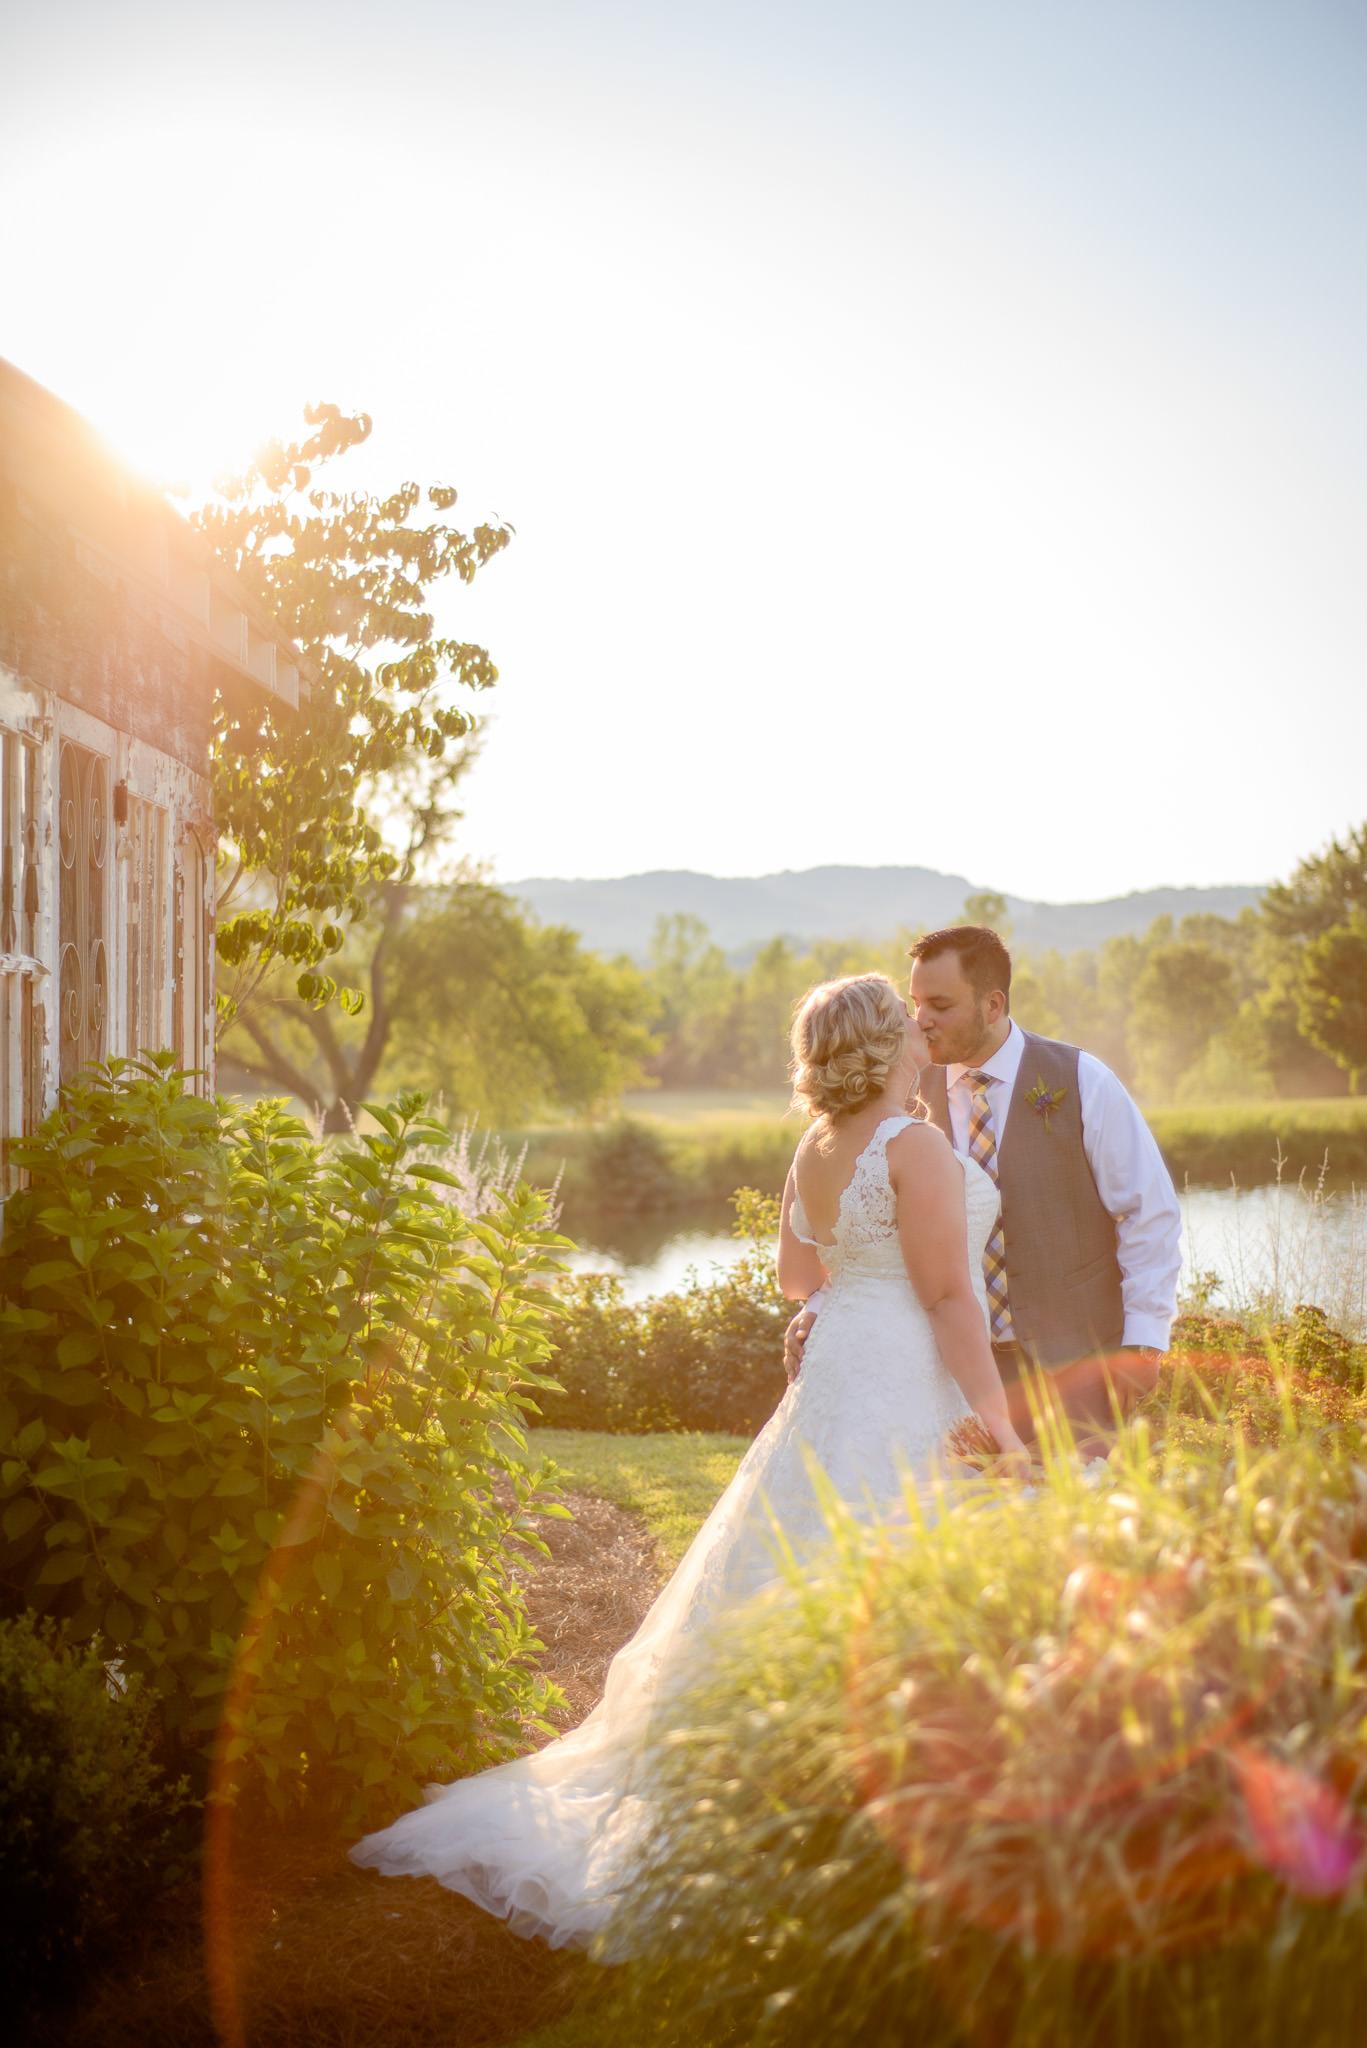 Greg and Jess Photography Nashville Portrait and Wedding Photographer 31.jpg